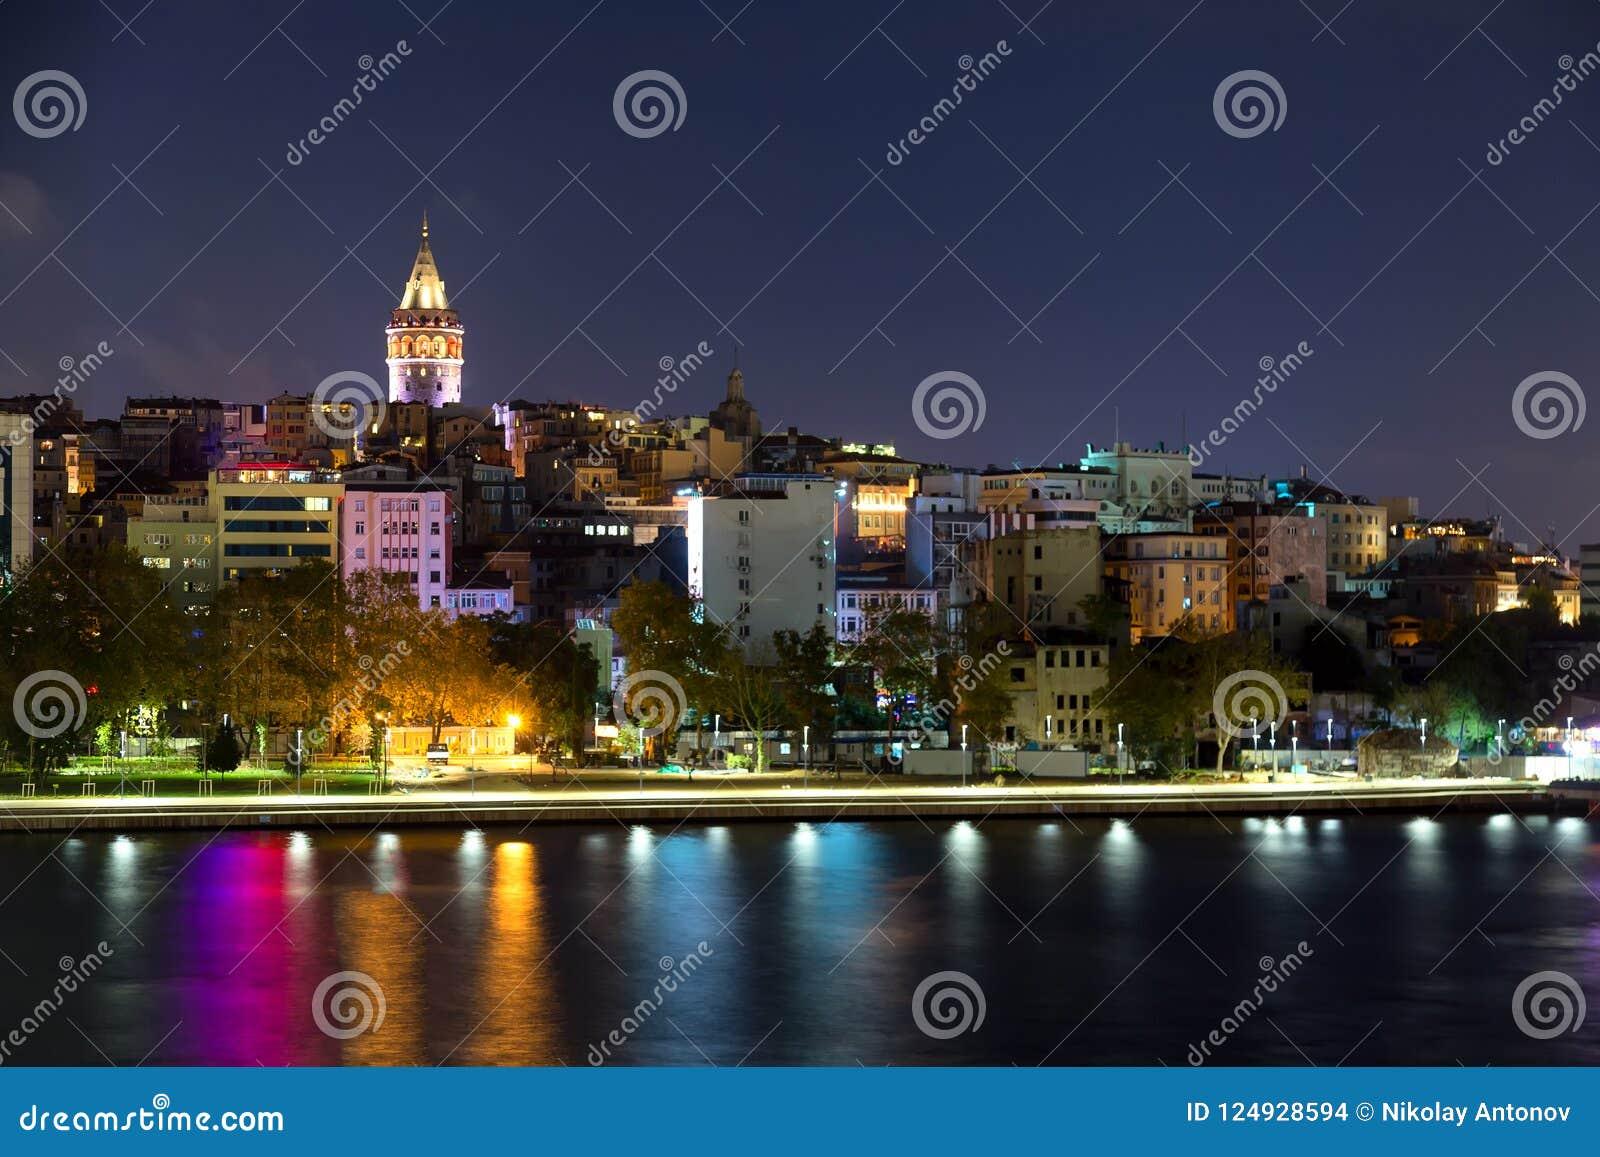 Beyoglu historic district and illuminated Galata tower medieval landmark in Istanbul at night, Turkey.